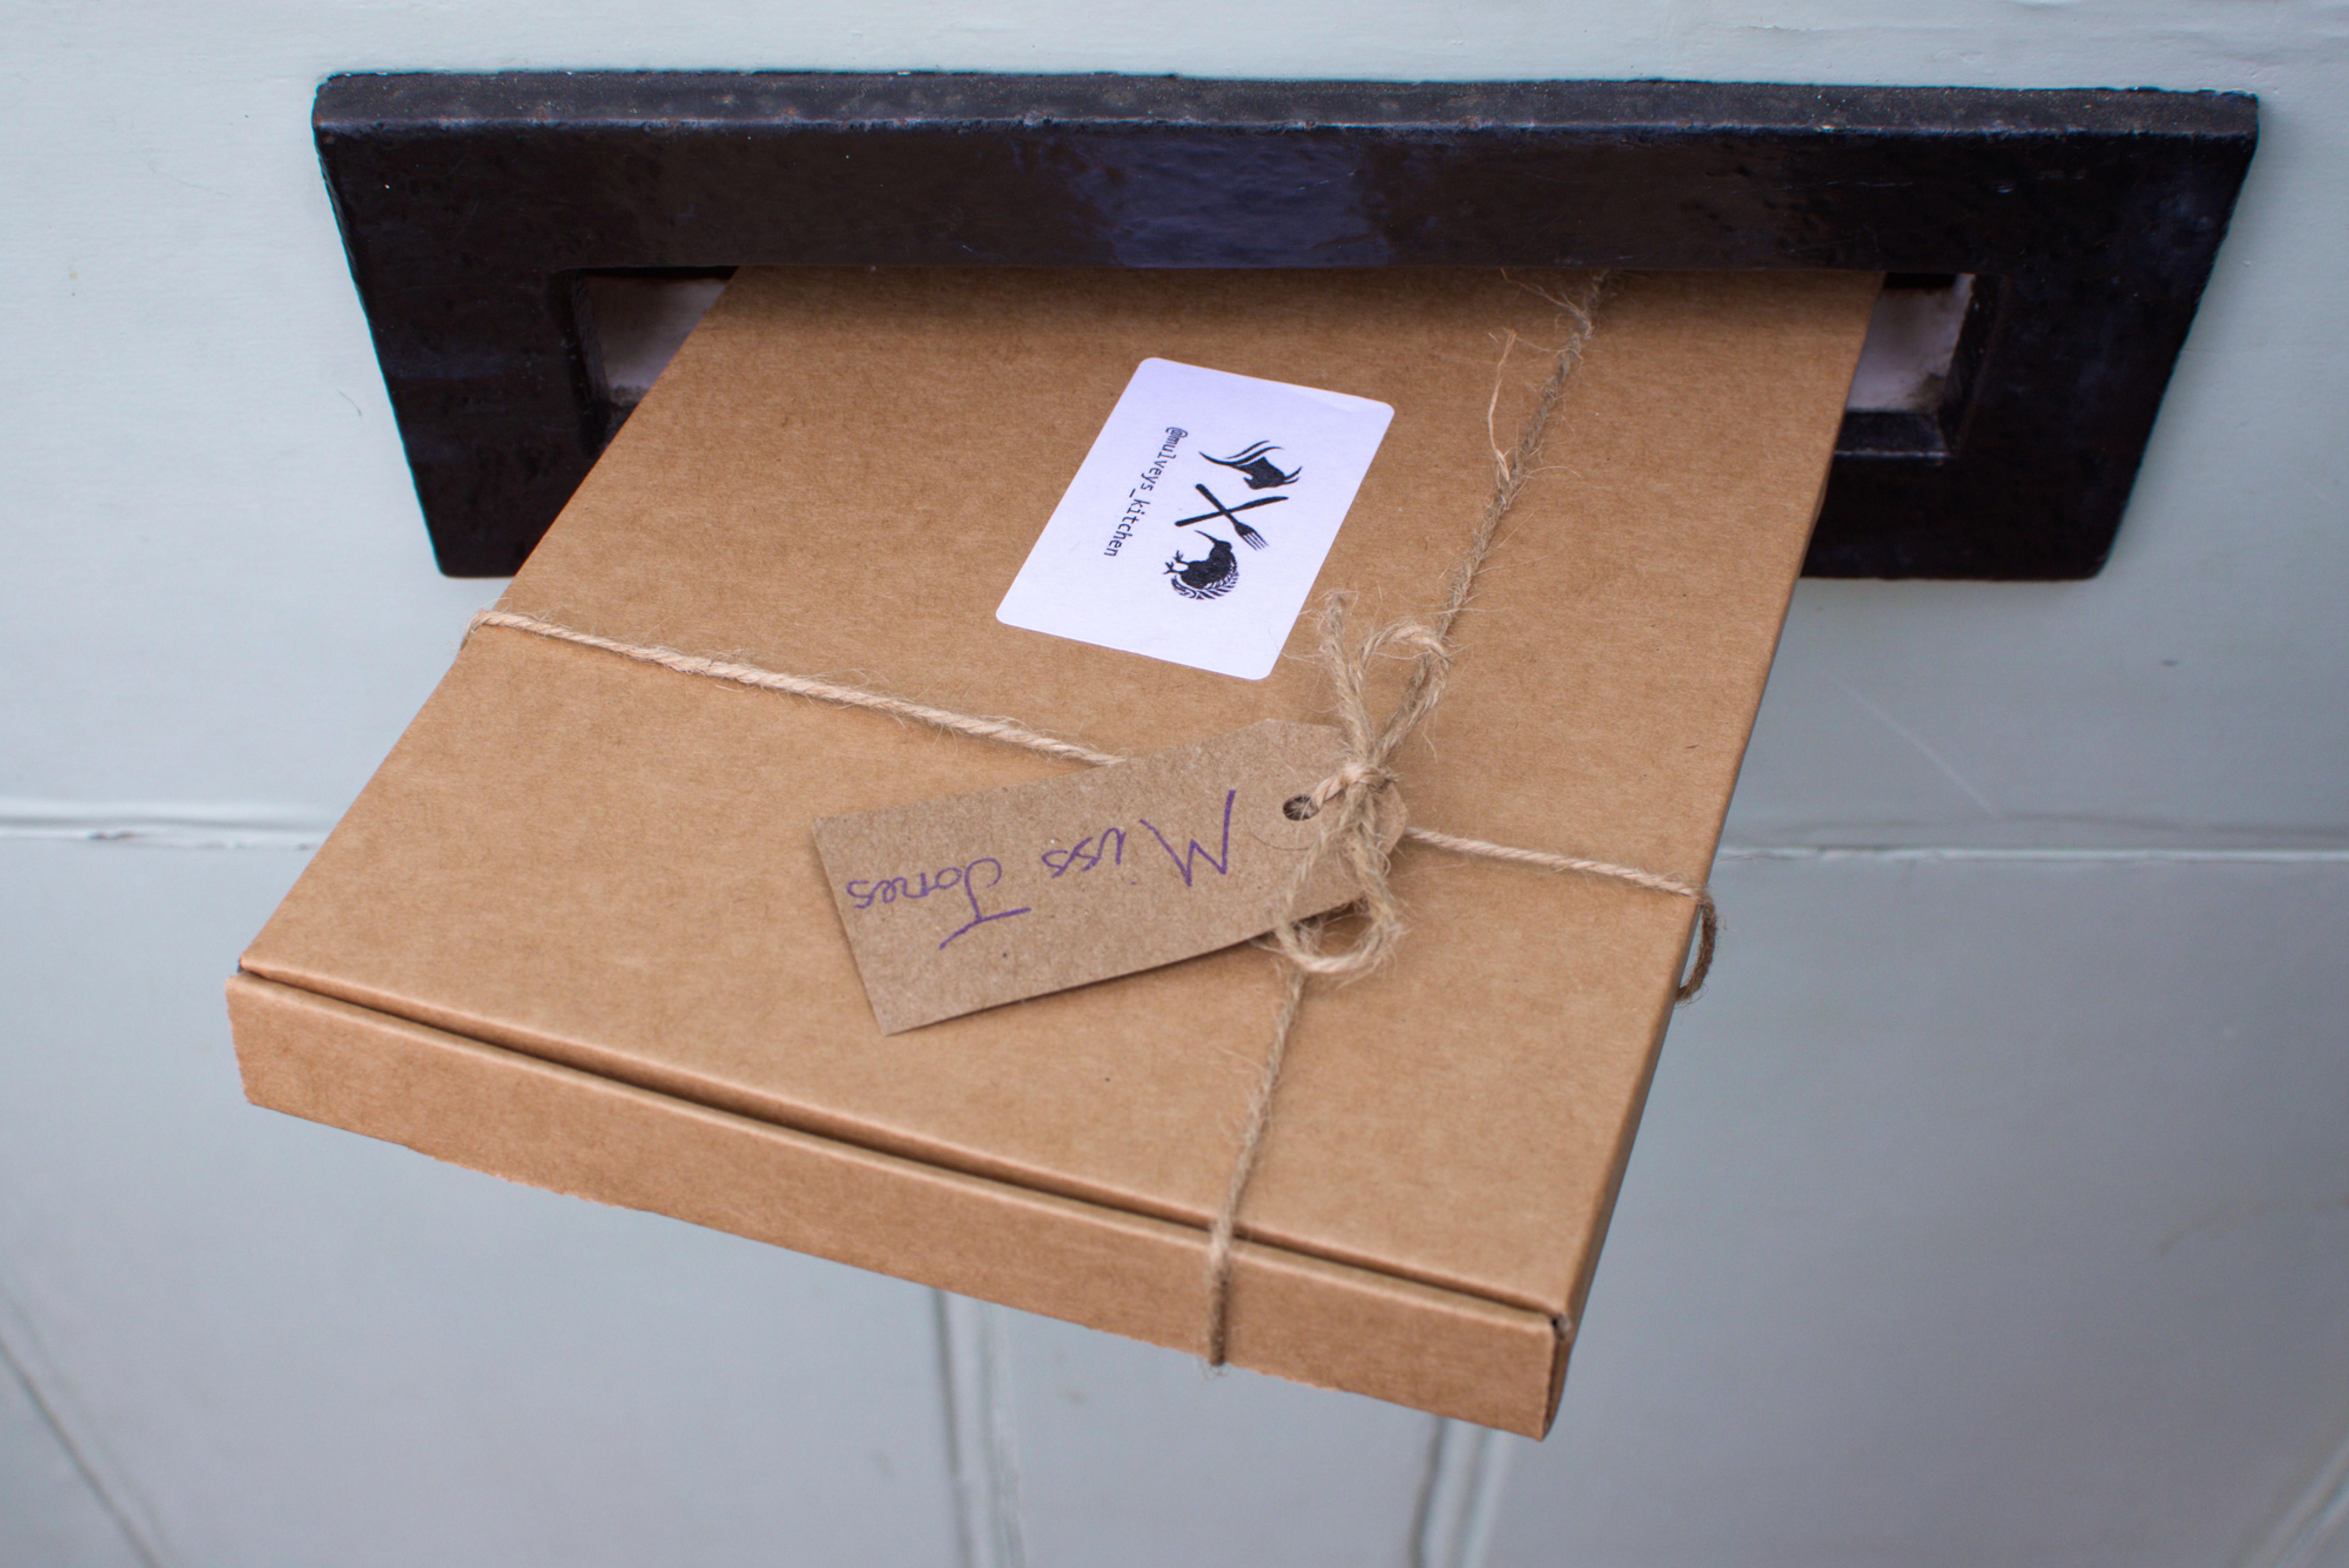 The classic rustic box